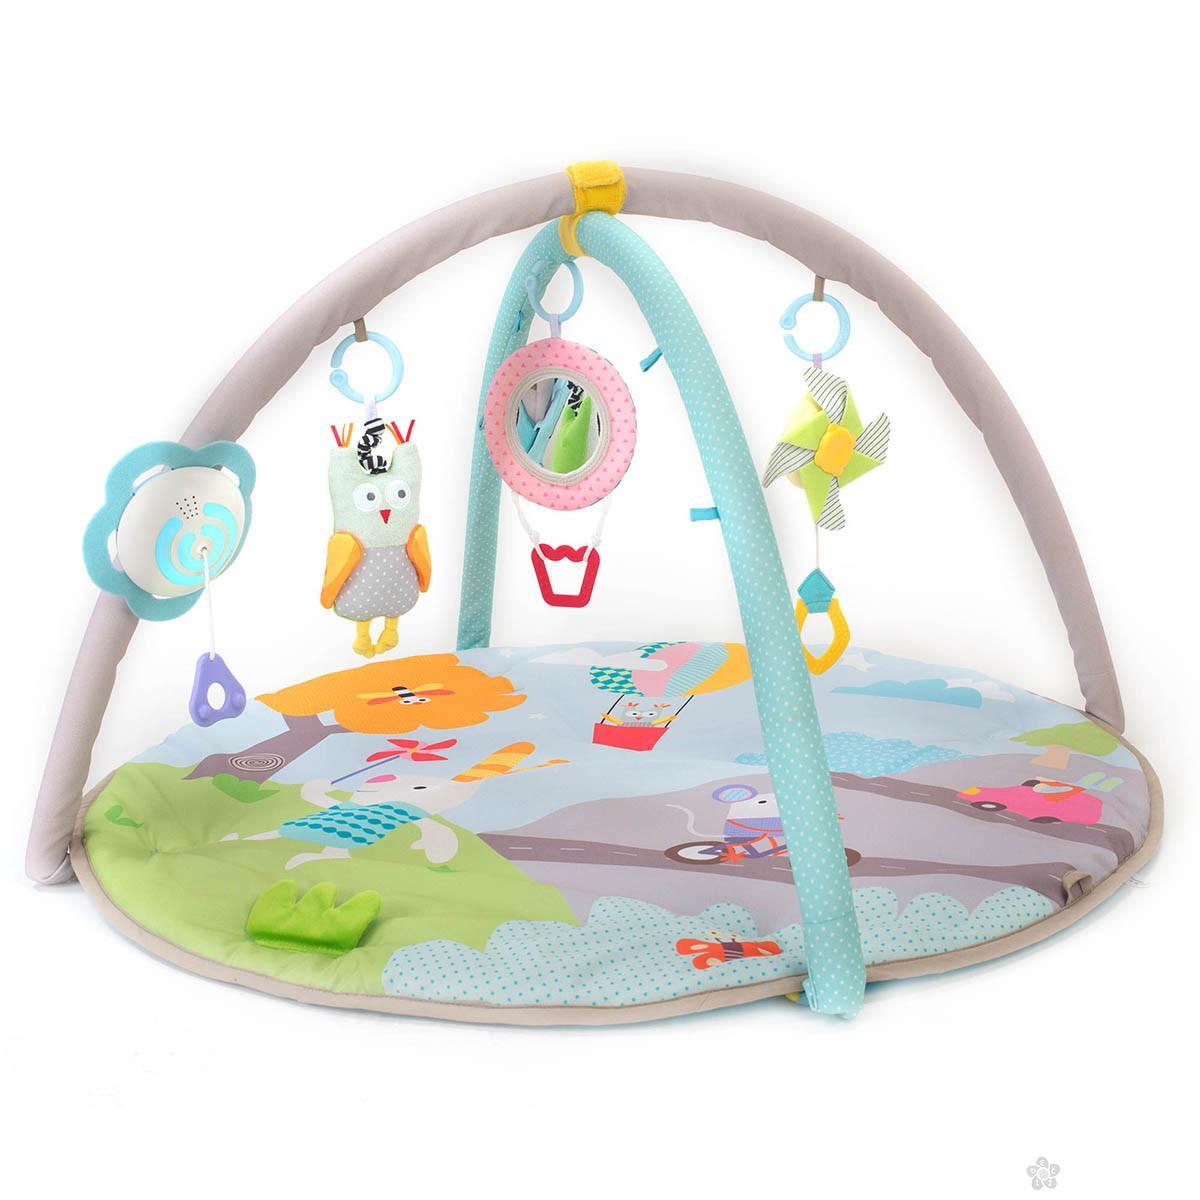 Taf Toys muzička podloga za igranje Priroda, 114005